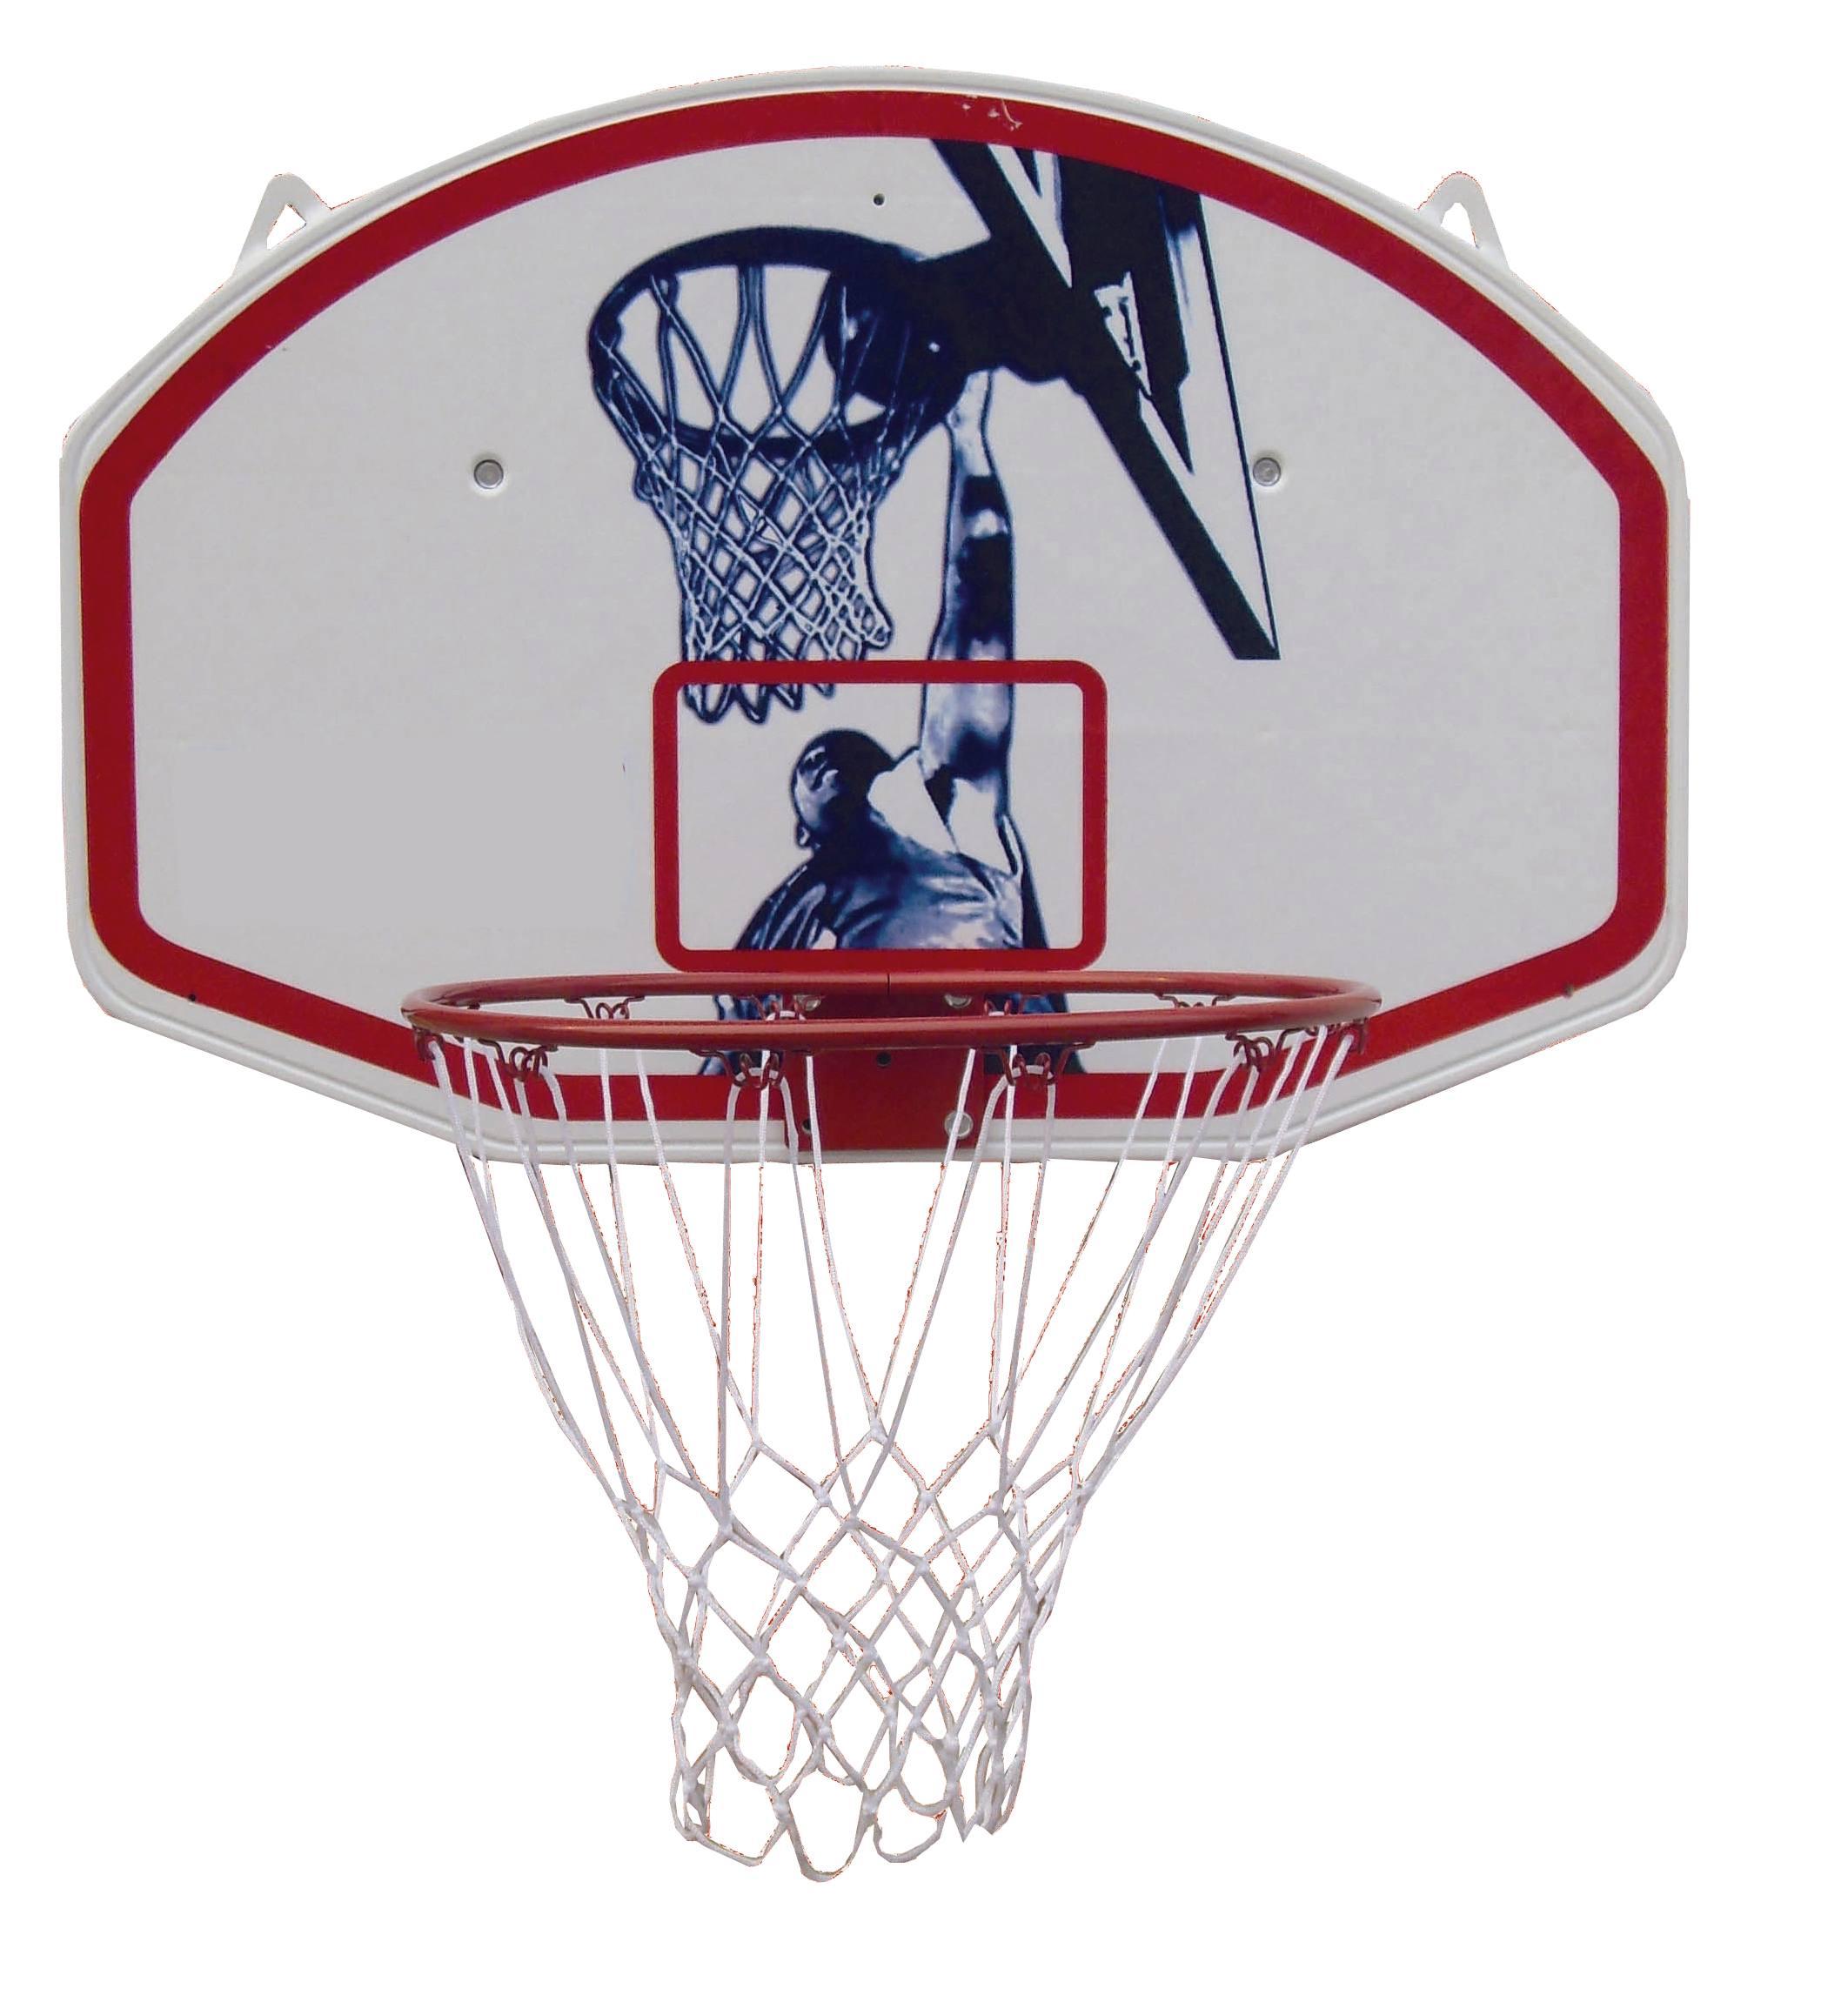 Basketbalová doska SPARTAN 90 x 60 cm